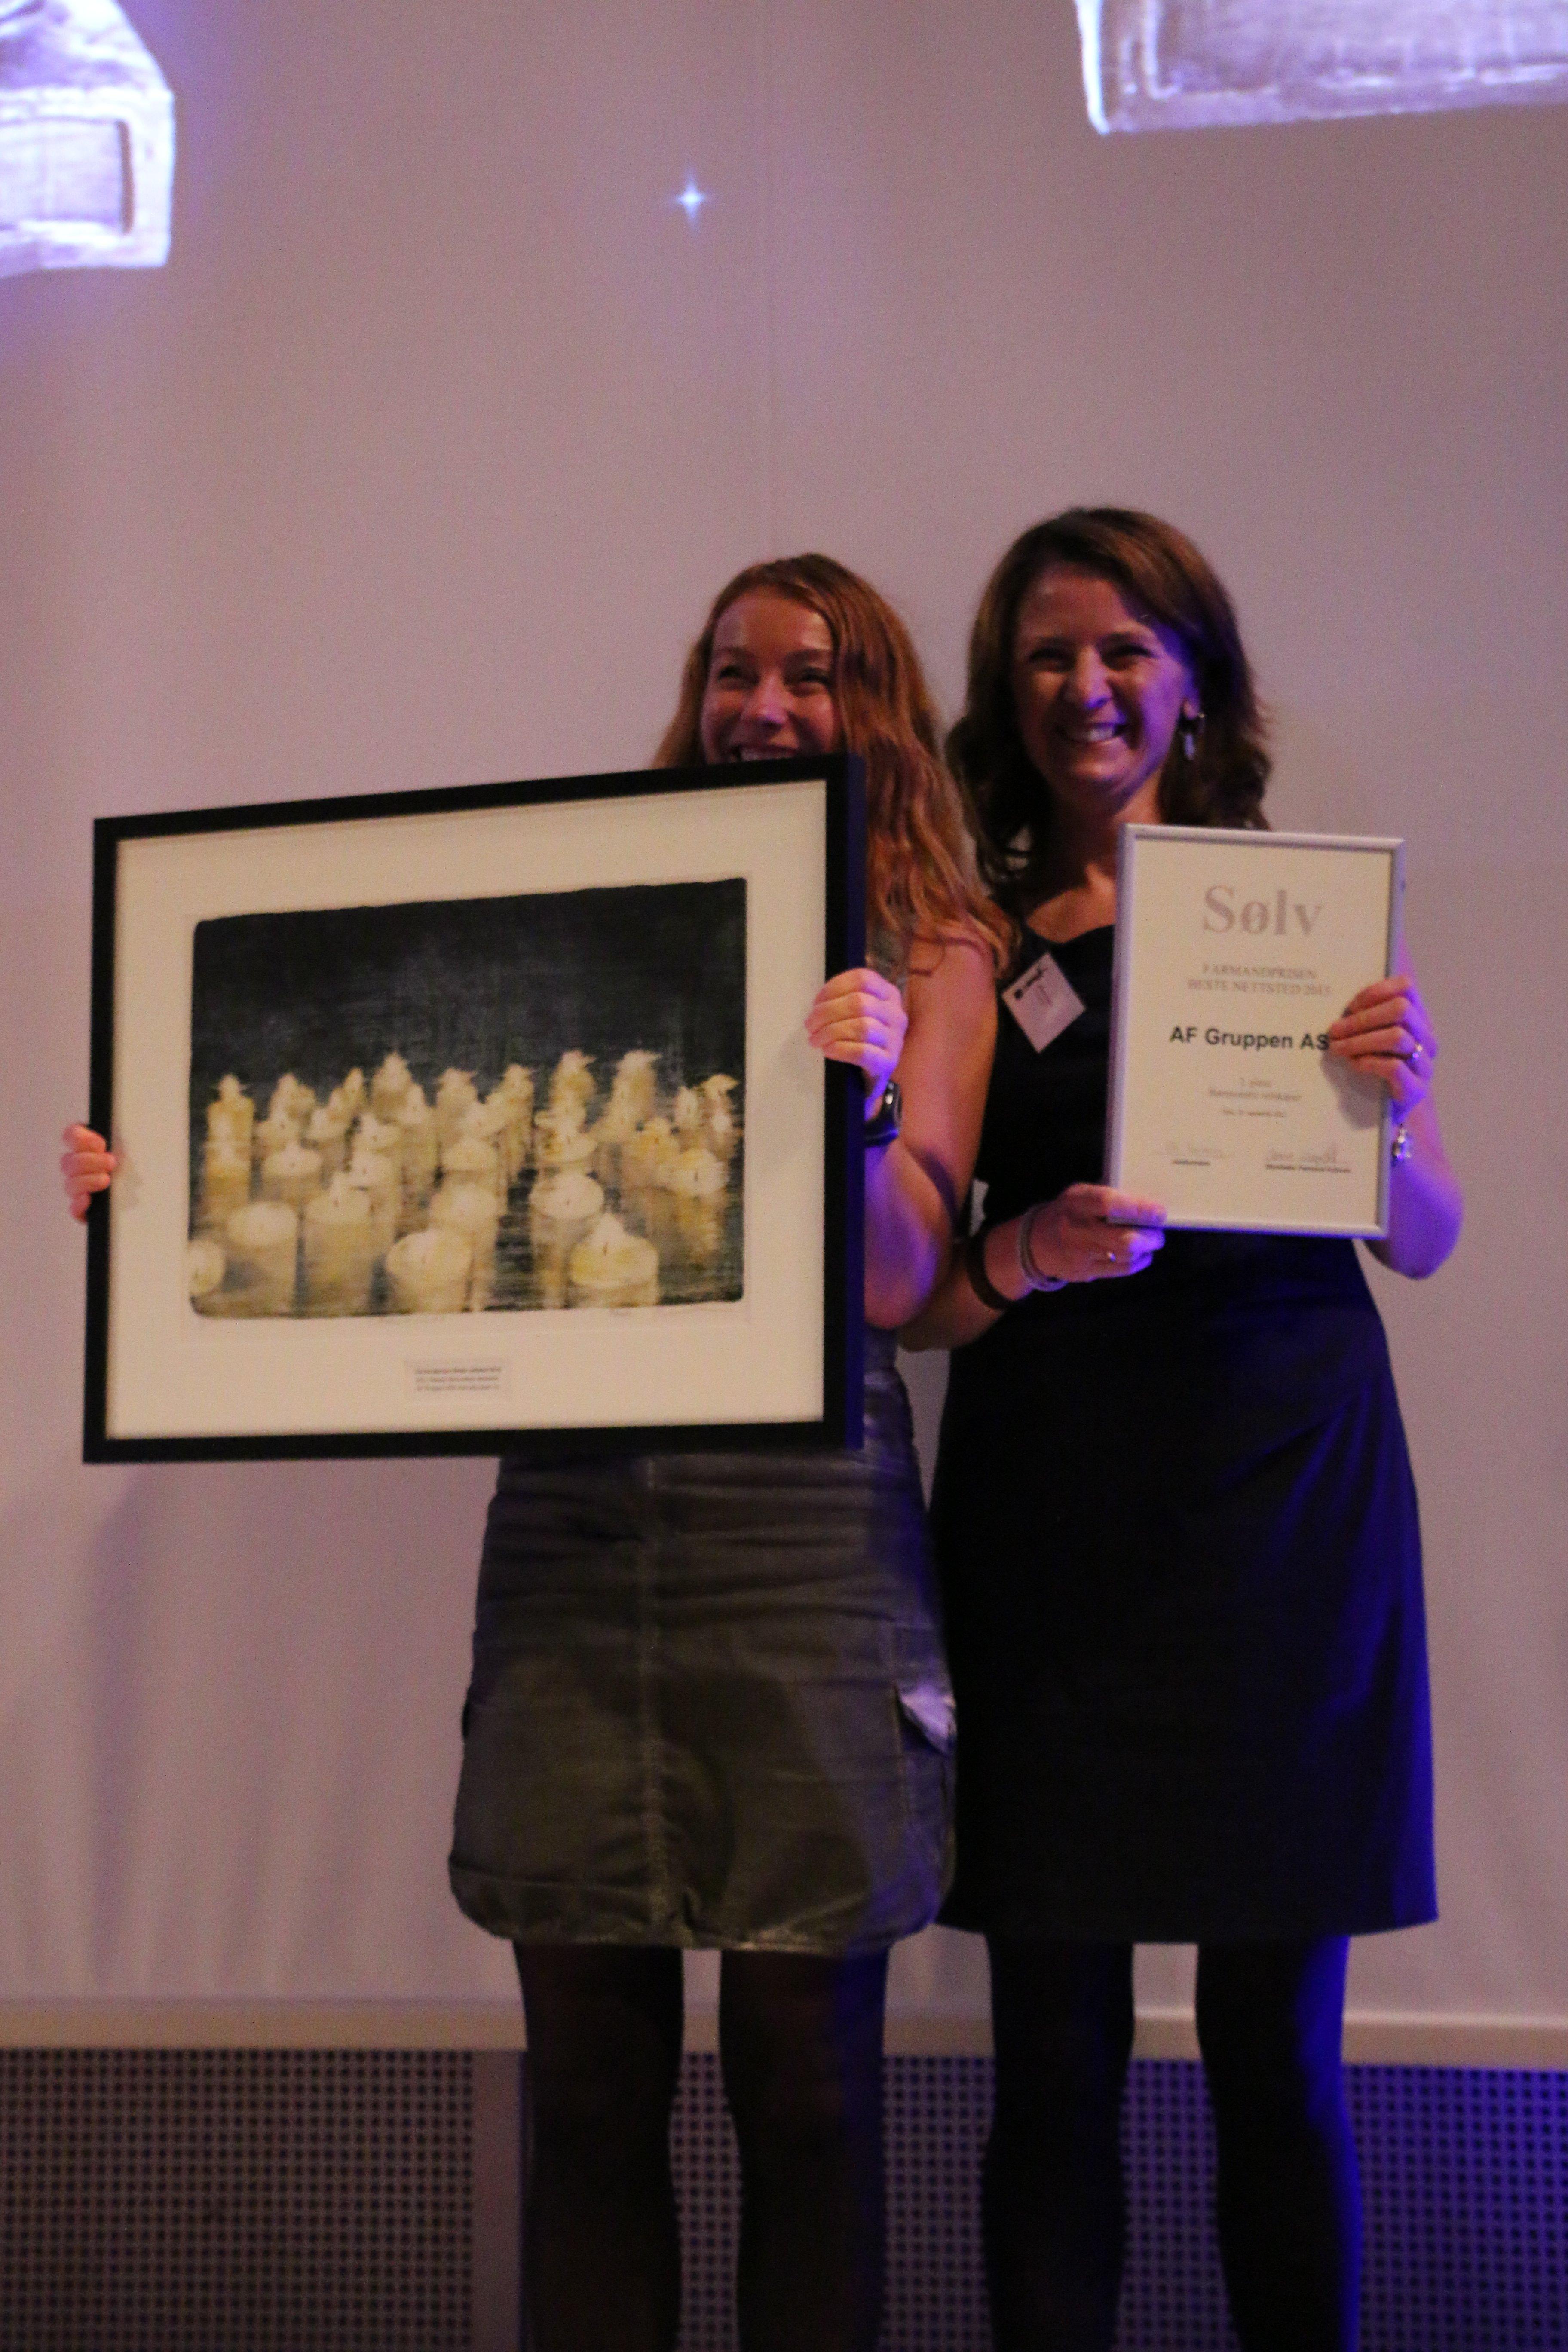 Farmandprisen Beste nettted 2015 - Børsnoterte selskaper nr. 2: AF Gruppen (afgruppen.no)